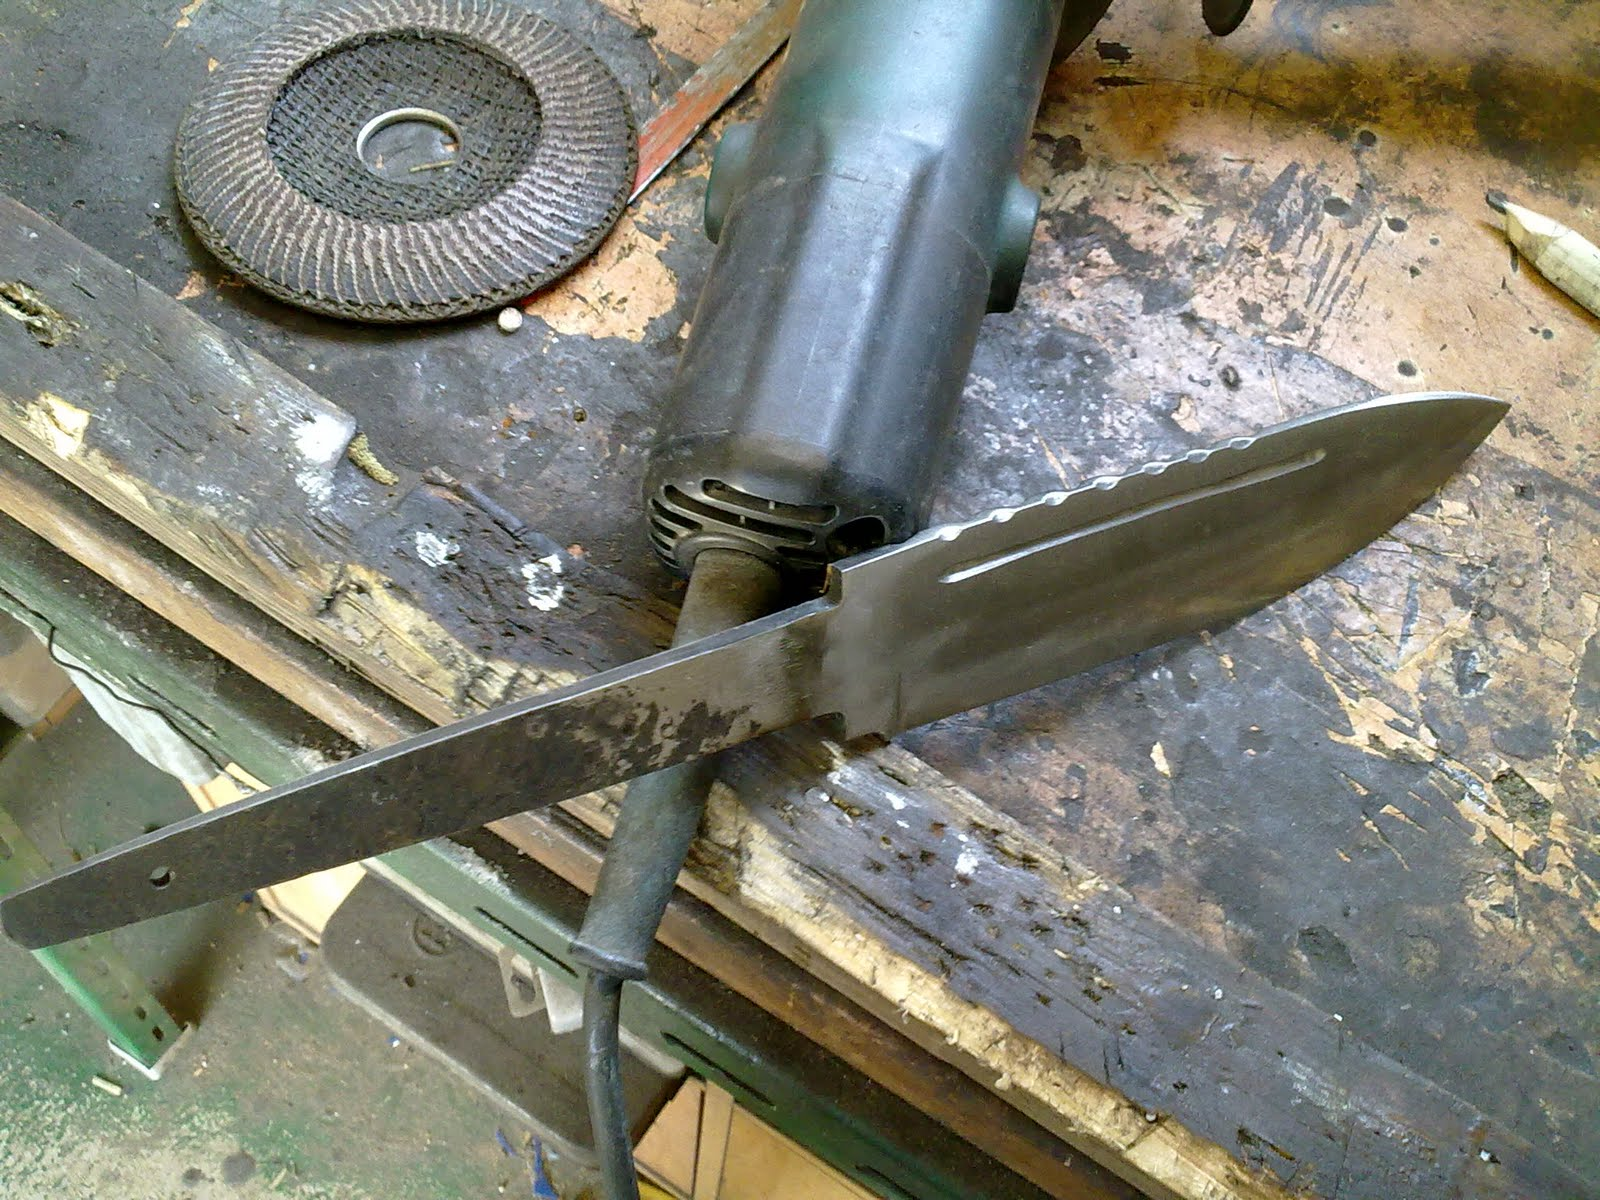 Ferro i foc cuchillo ancho - Como hacer soporte para cuchillos ...